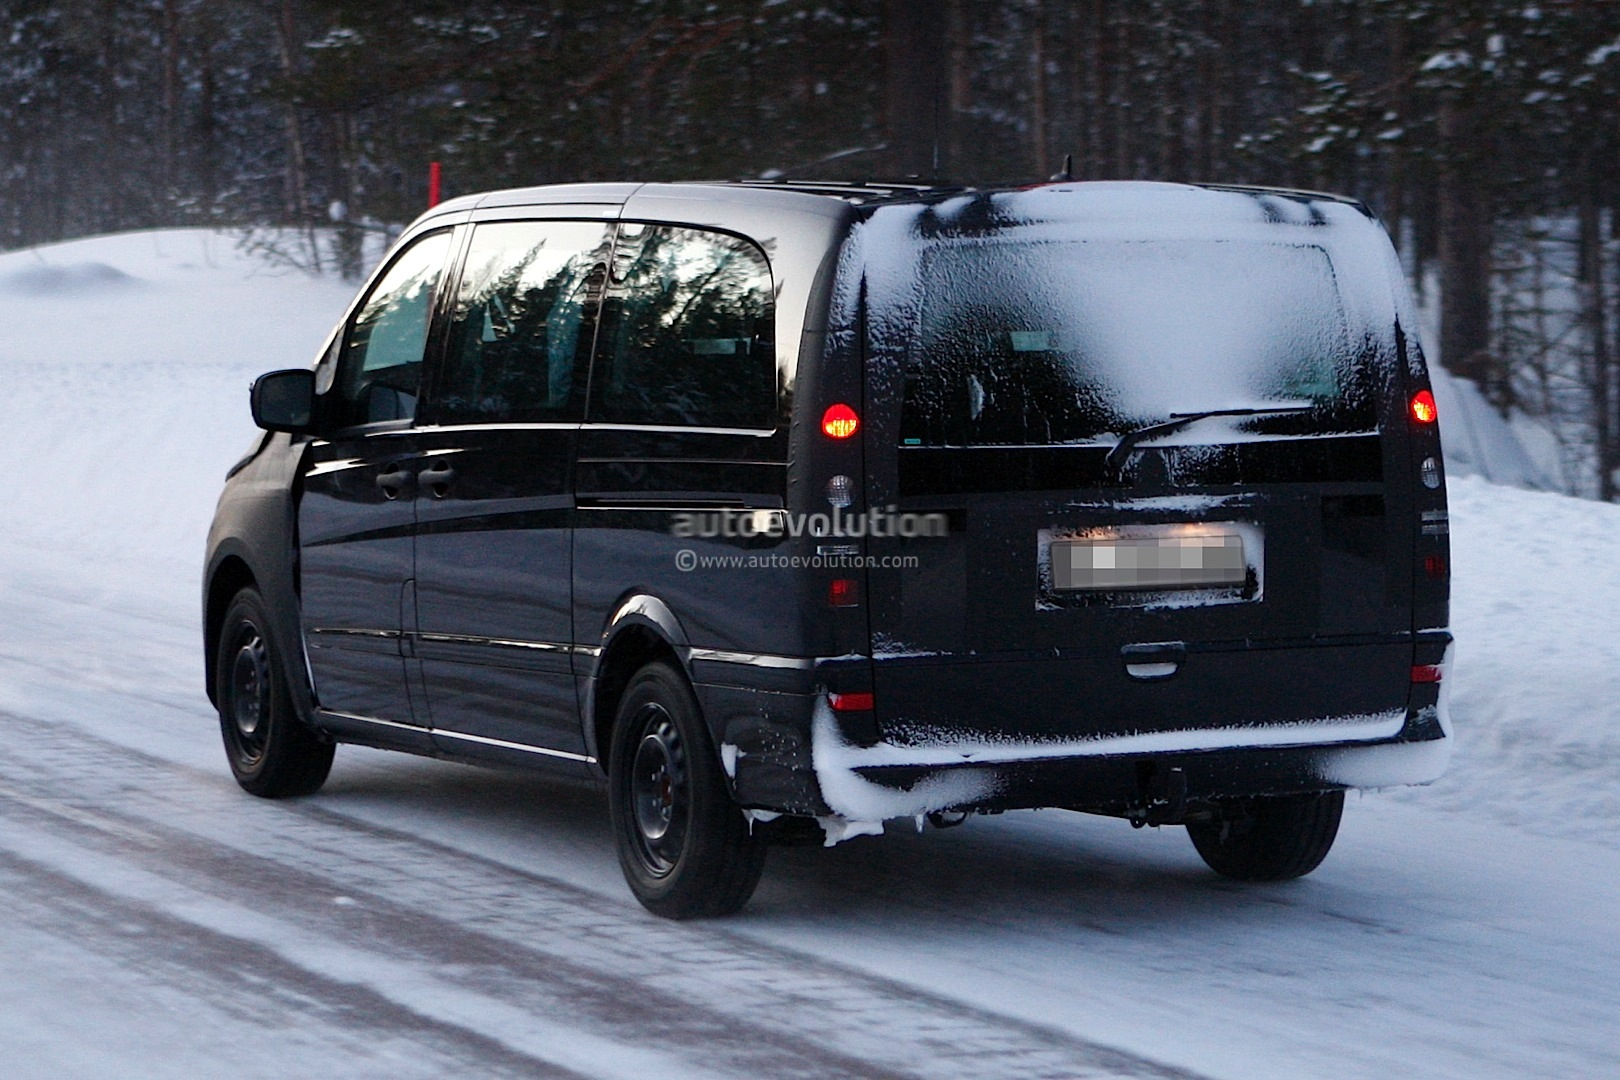 Spyshots: 2013 Mercedes-Benz Viano - autoevolution